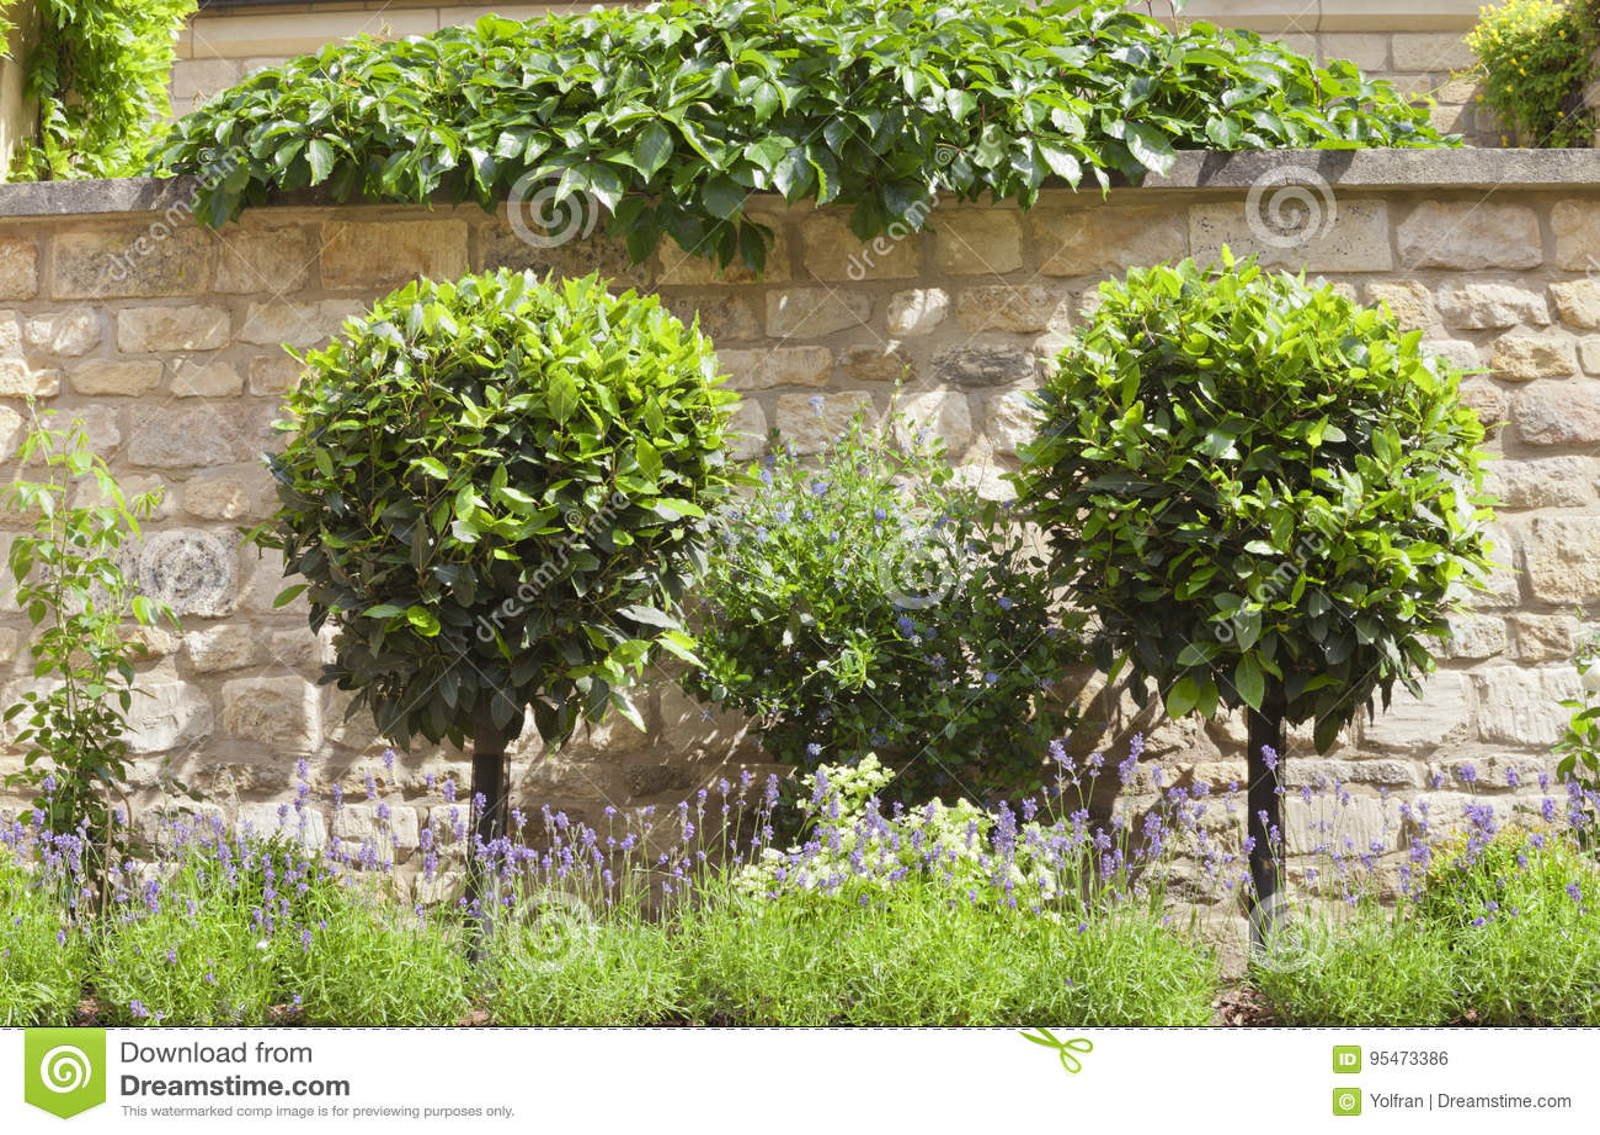 Ornamental Topiary Trees Purple Lavender In Summer Garden Stock